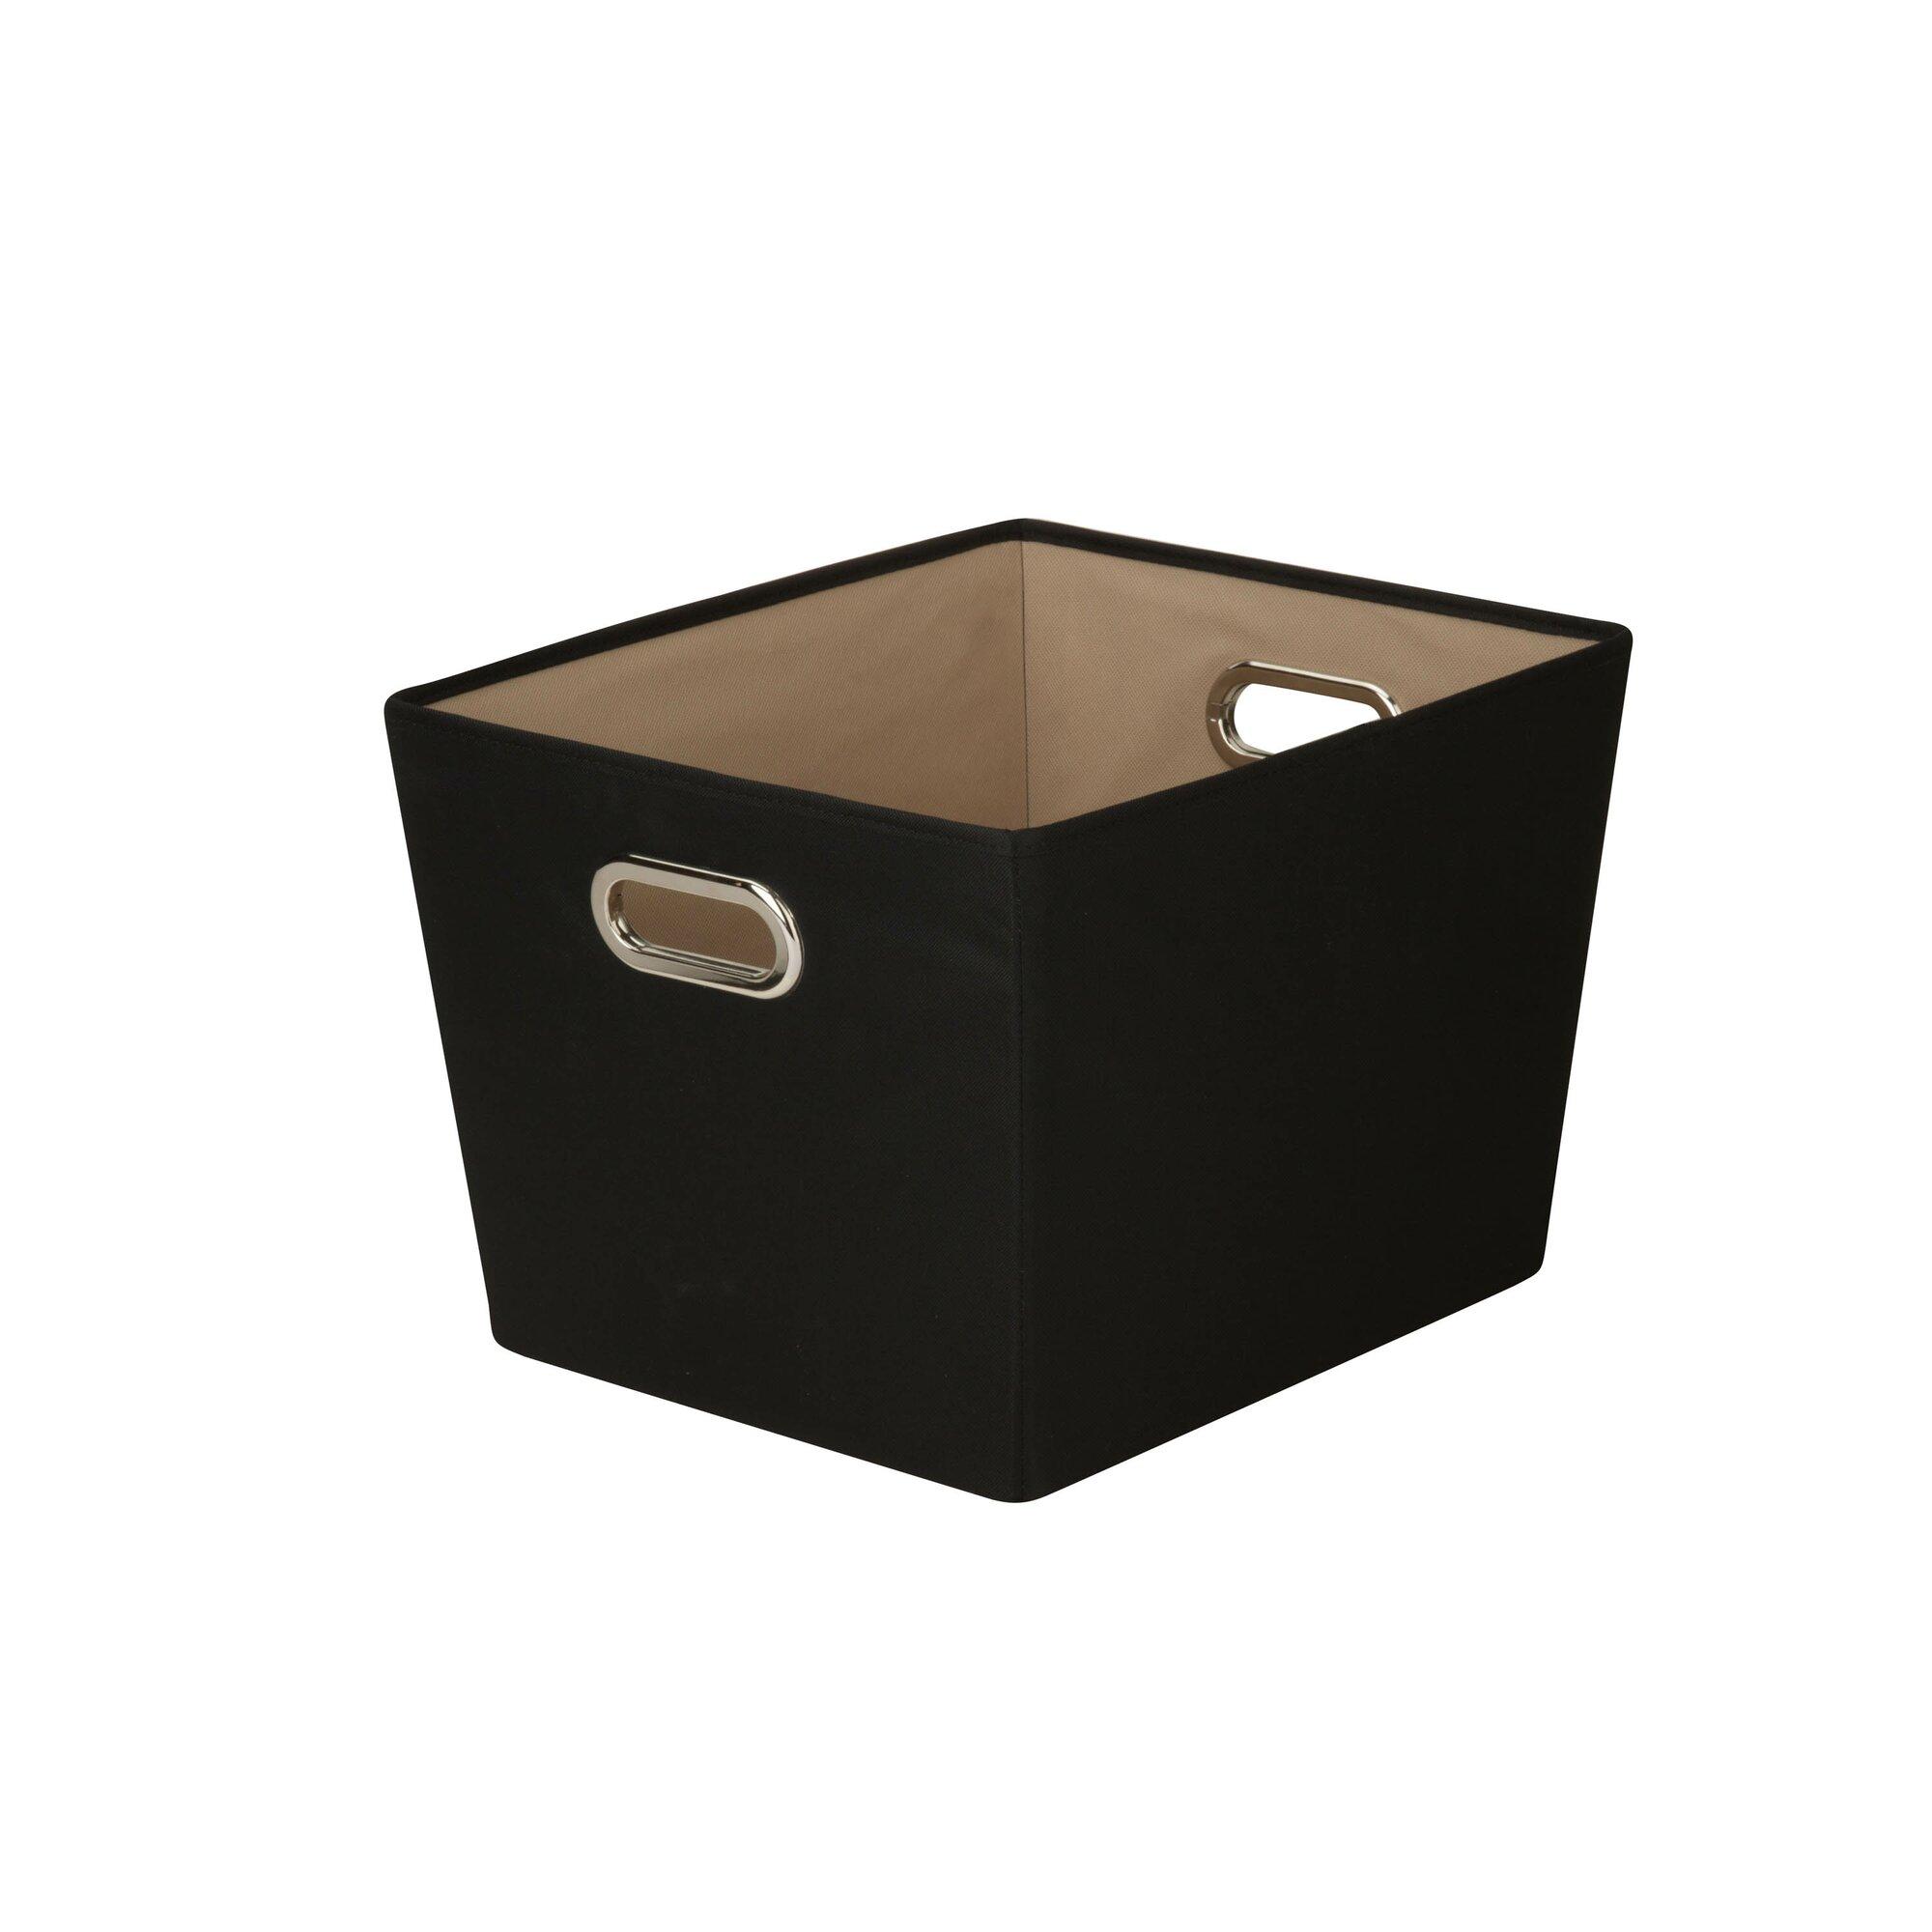 decorative storage bin with handle - Decorative Storage Baskets